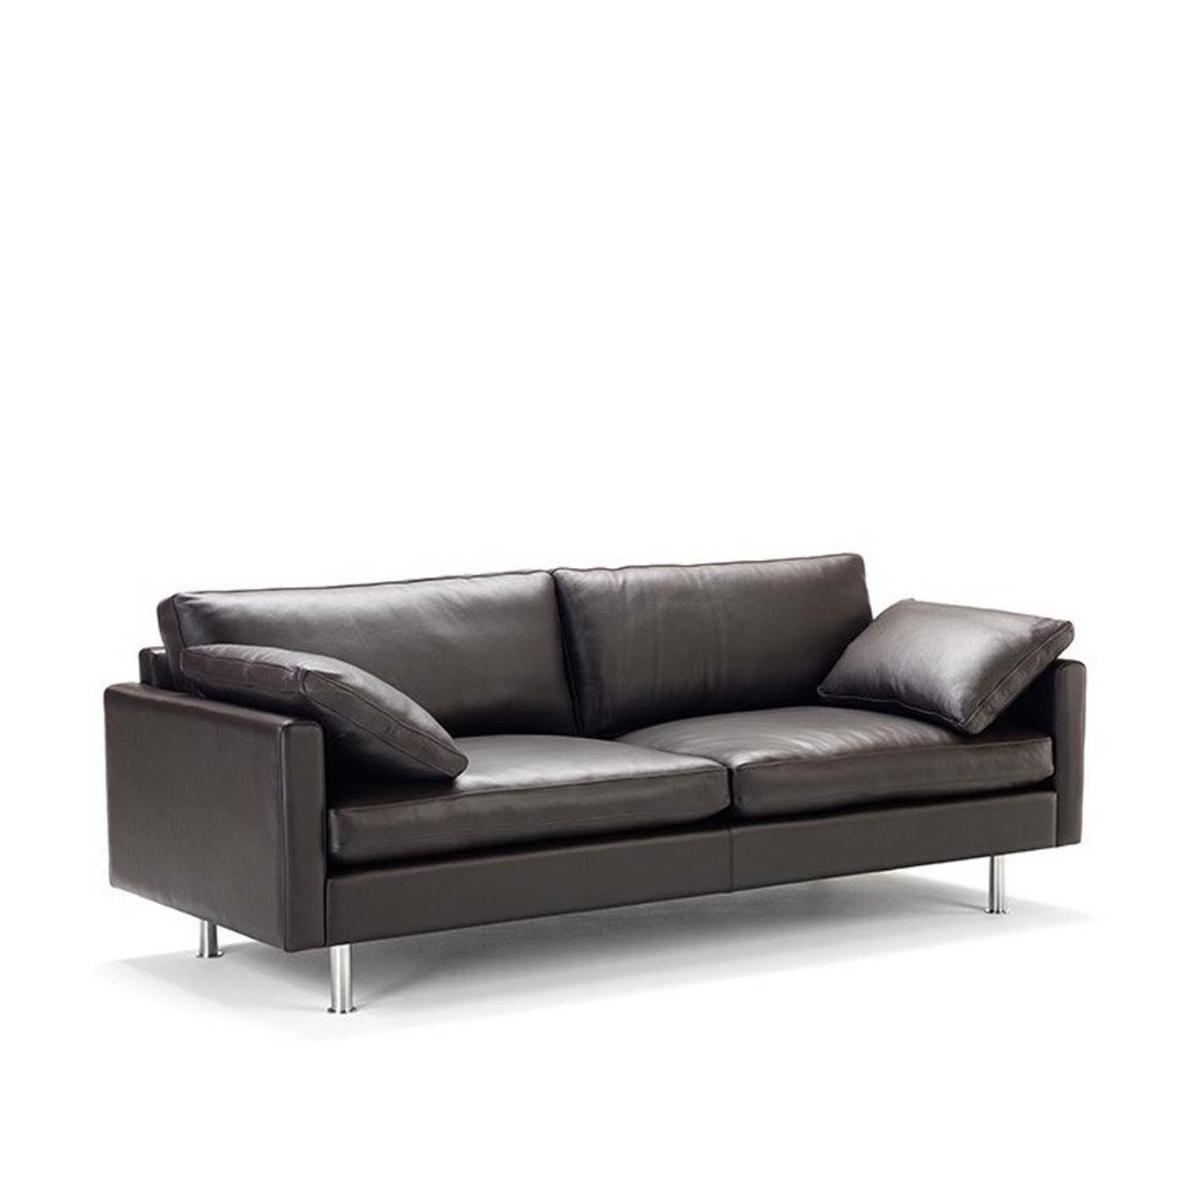 Wendelbo   Nova V.2 Sofa - Bolighuset Werenberg